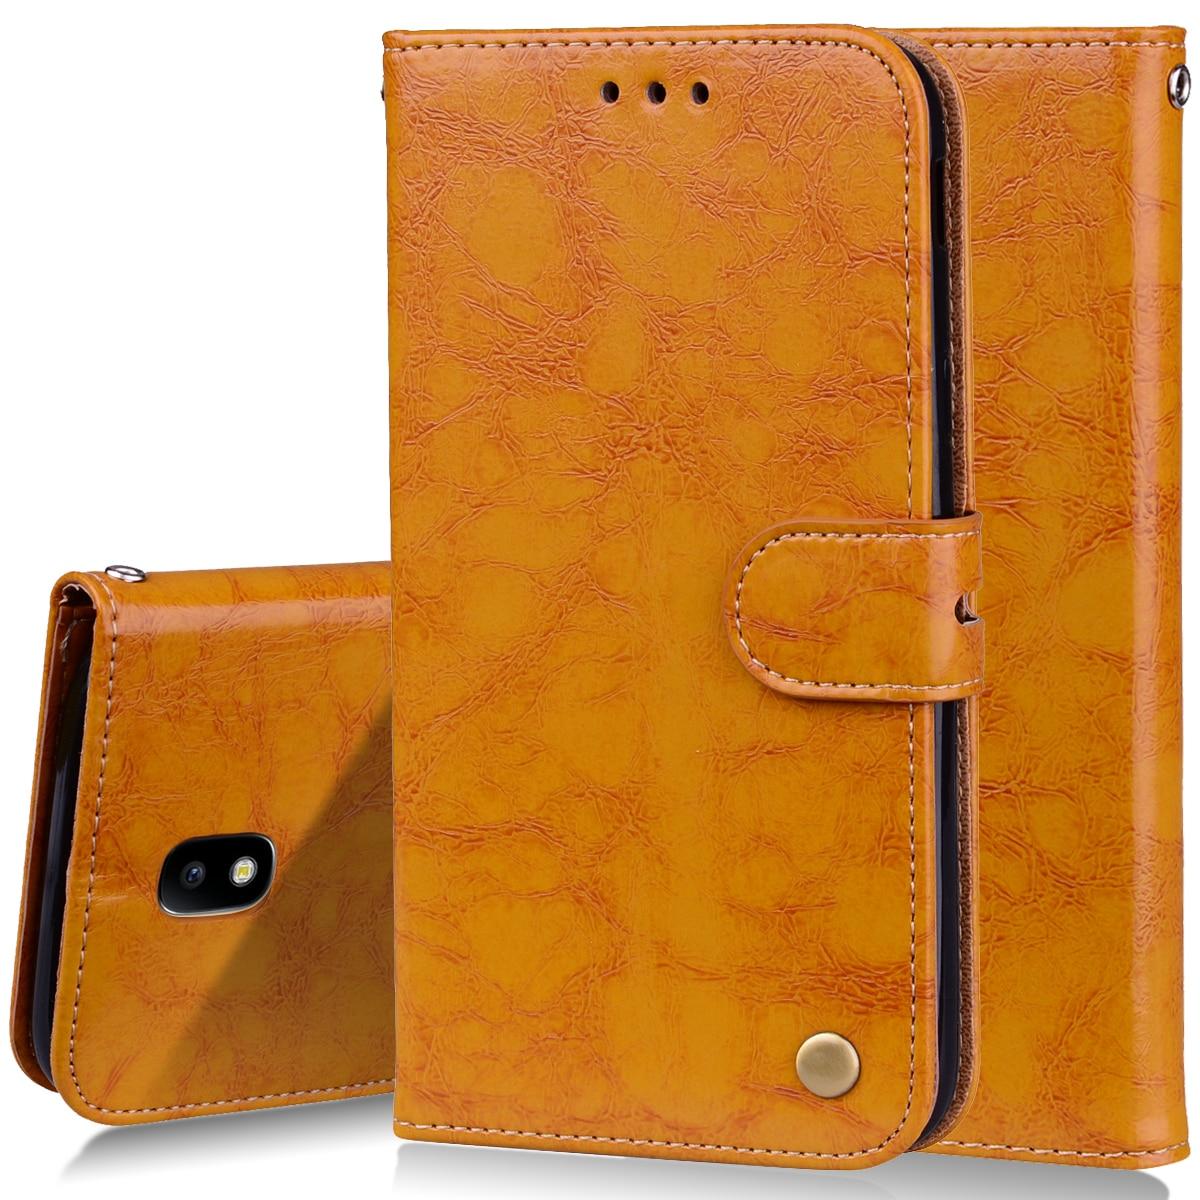 Galleria fotografica for Samsung Galaxy J3 2017 J330 Flip PU Leather Cases for Samsung J3 2017 Wallet Bag Phone Case Cover Etui